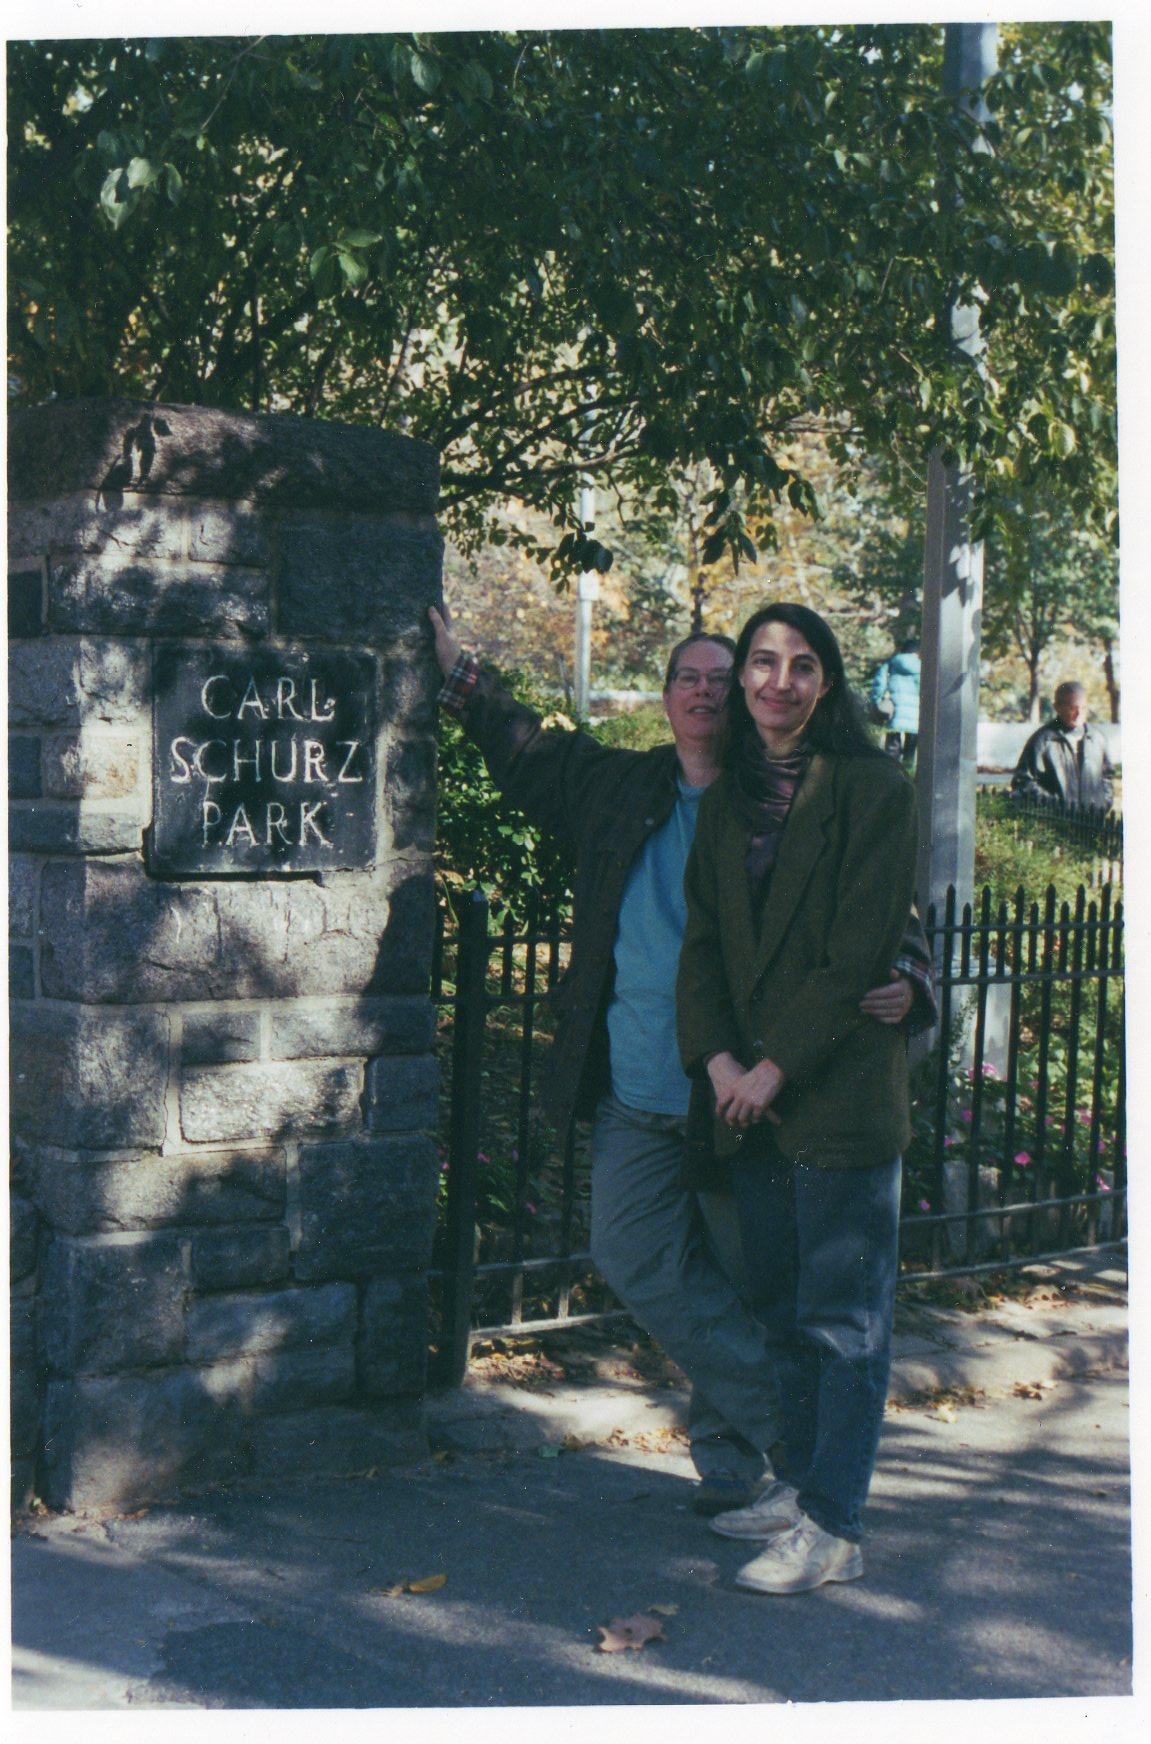 carl schurz park gate